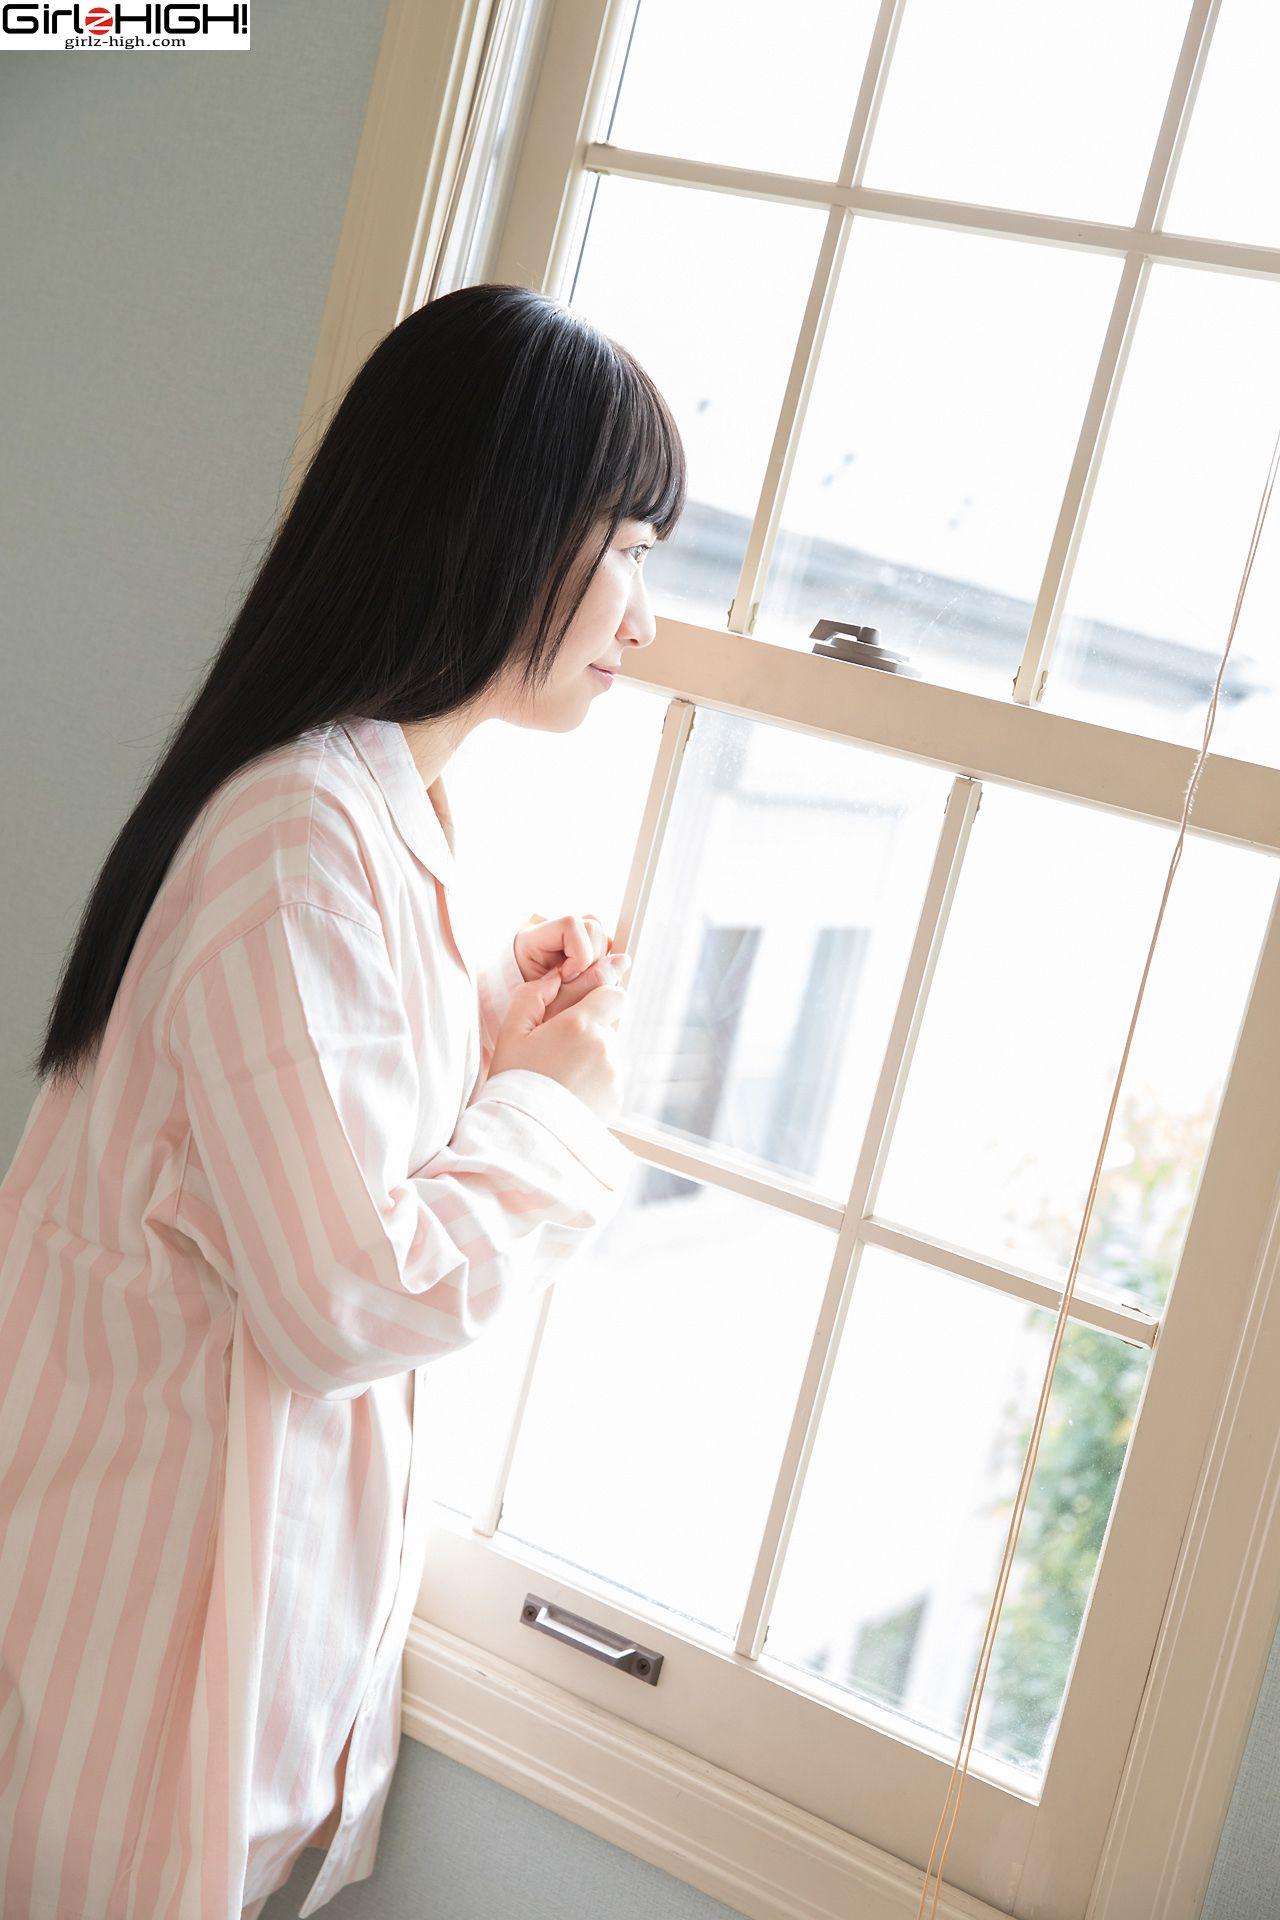 VOL.661 [Girlz-High]日本萌妹子黑长直:叶月彩菜(葉月彩菜)超高清写真套图(40P)